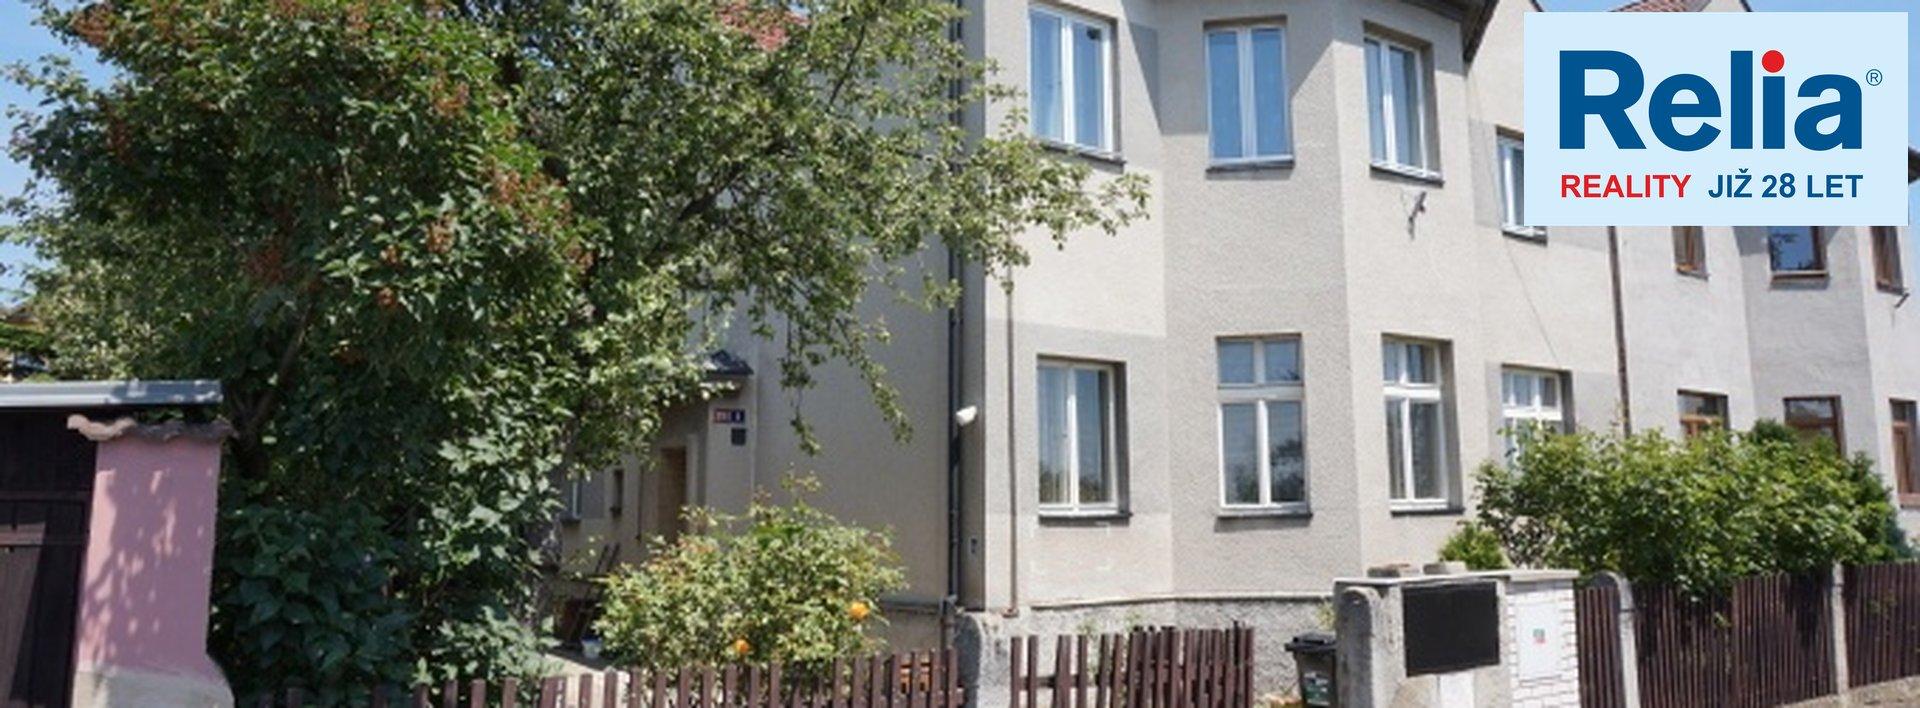 Prodej, Rodinné domy, 886 m², Novosedlice, Teplice., Ev.č.: N48124